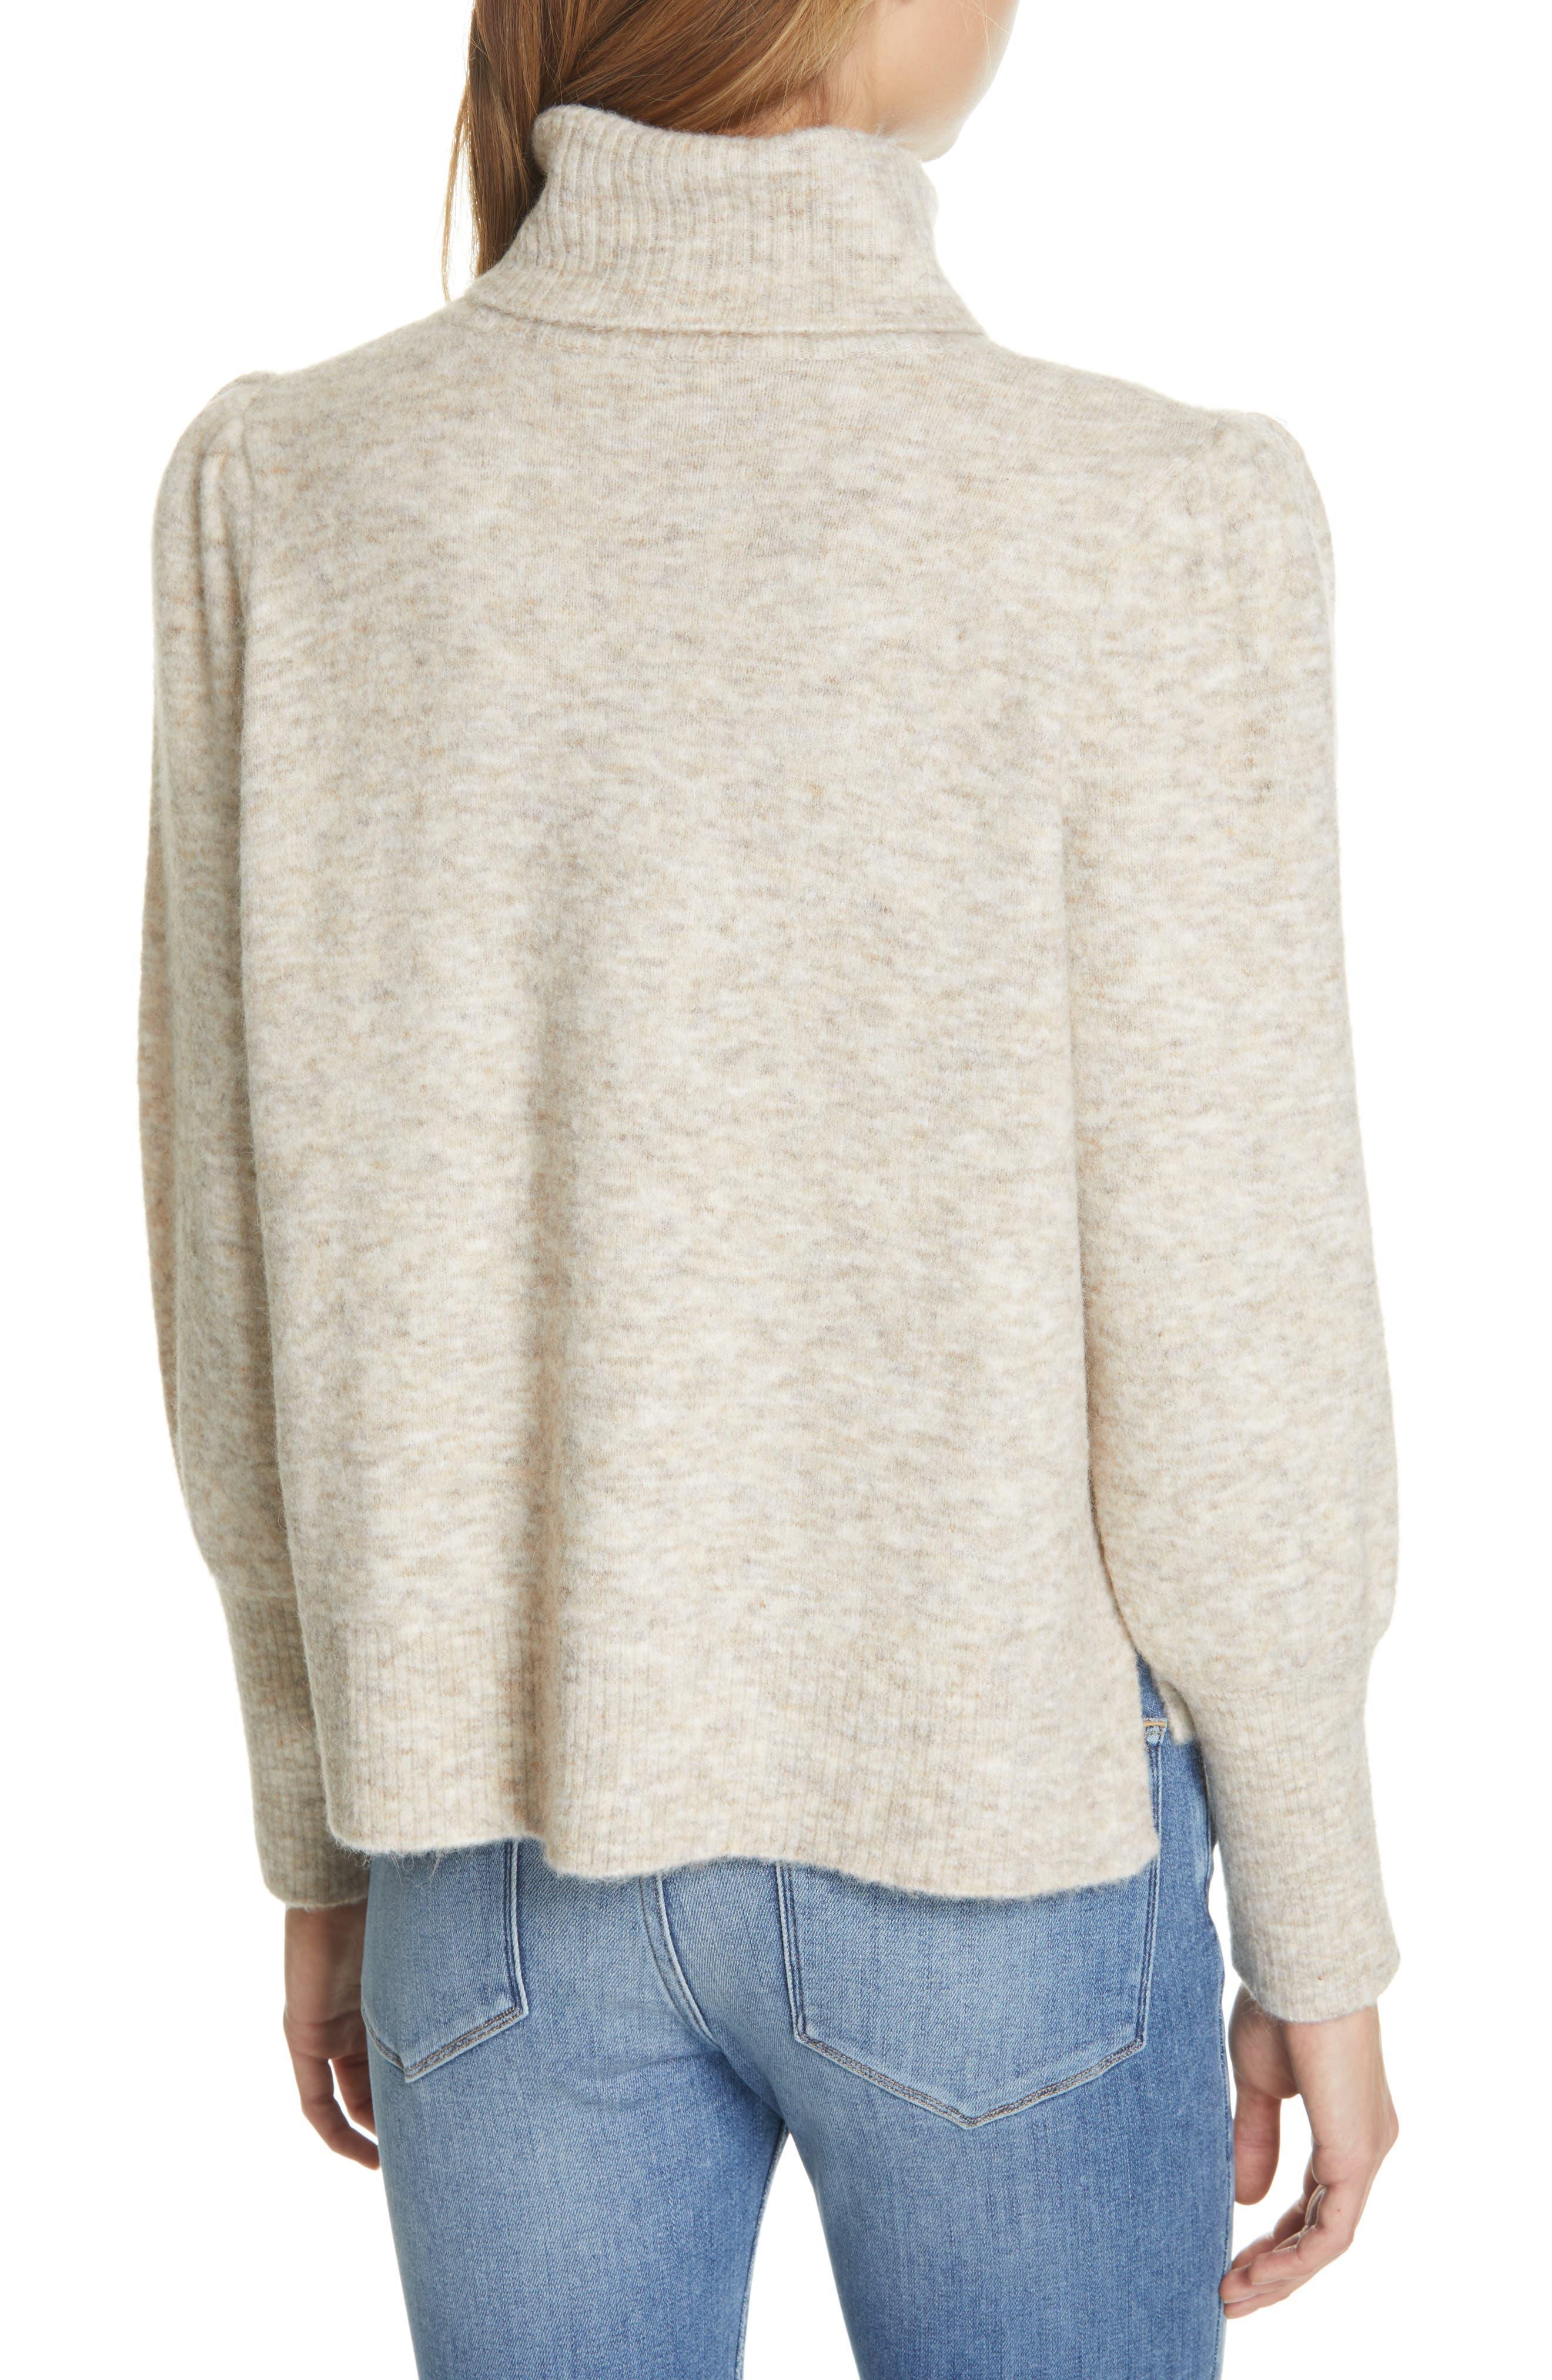 Swingy Turtleneck Sweater,                             Alternate thumbnail 2, color,                             OATMEAL